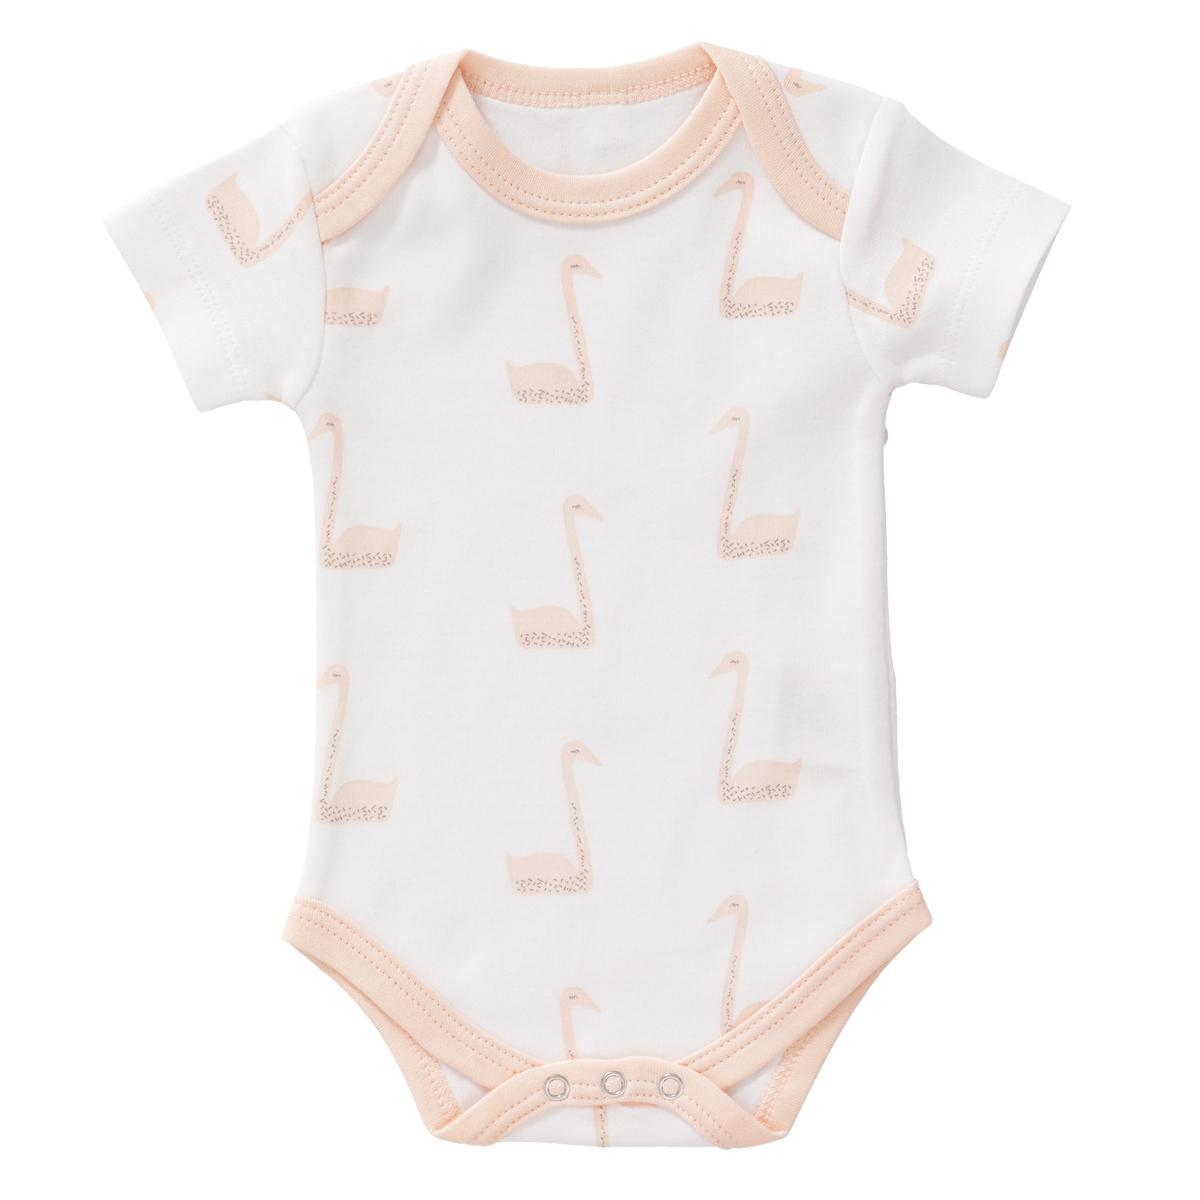 Body & Pyjama Body Manches Courtes Cygnes - 0/3 Mois Fresk - AR201802230249